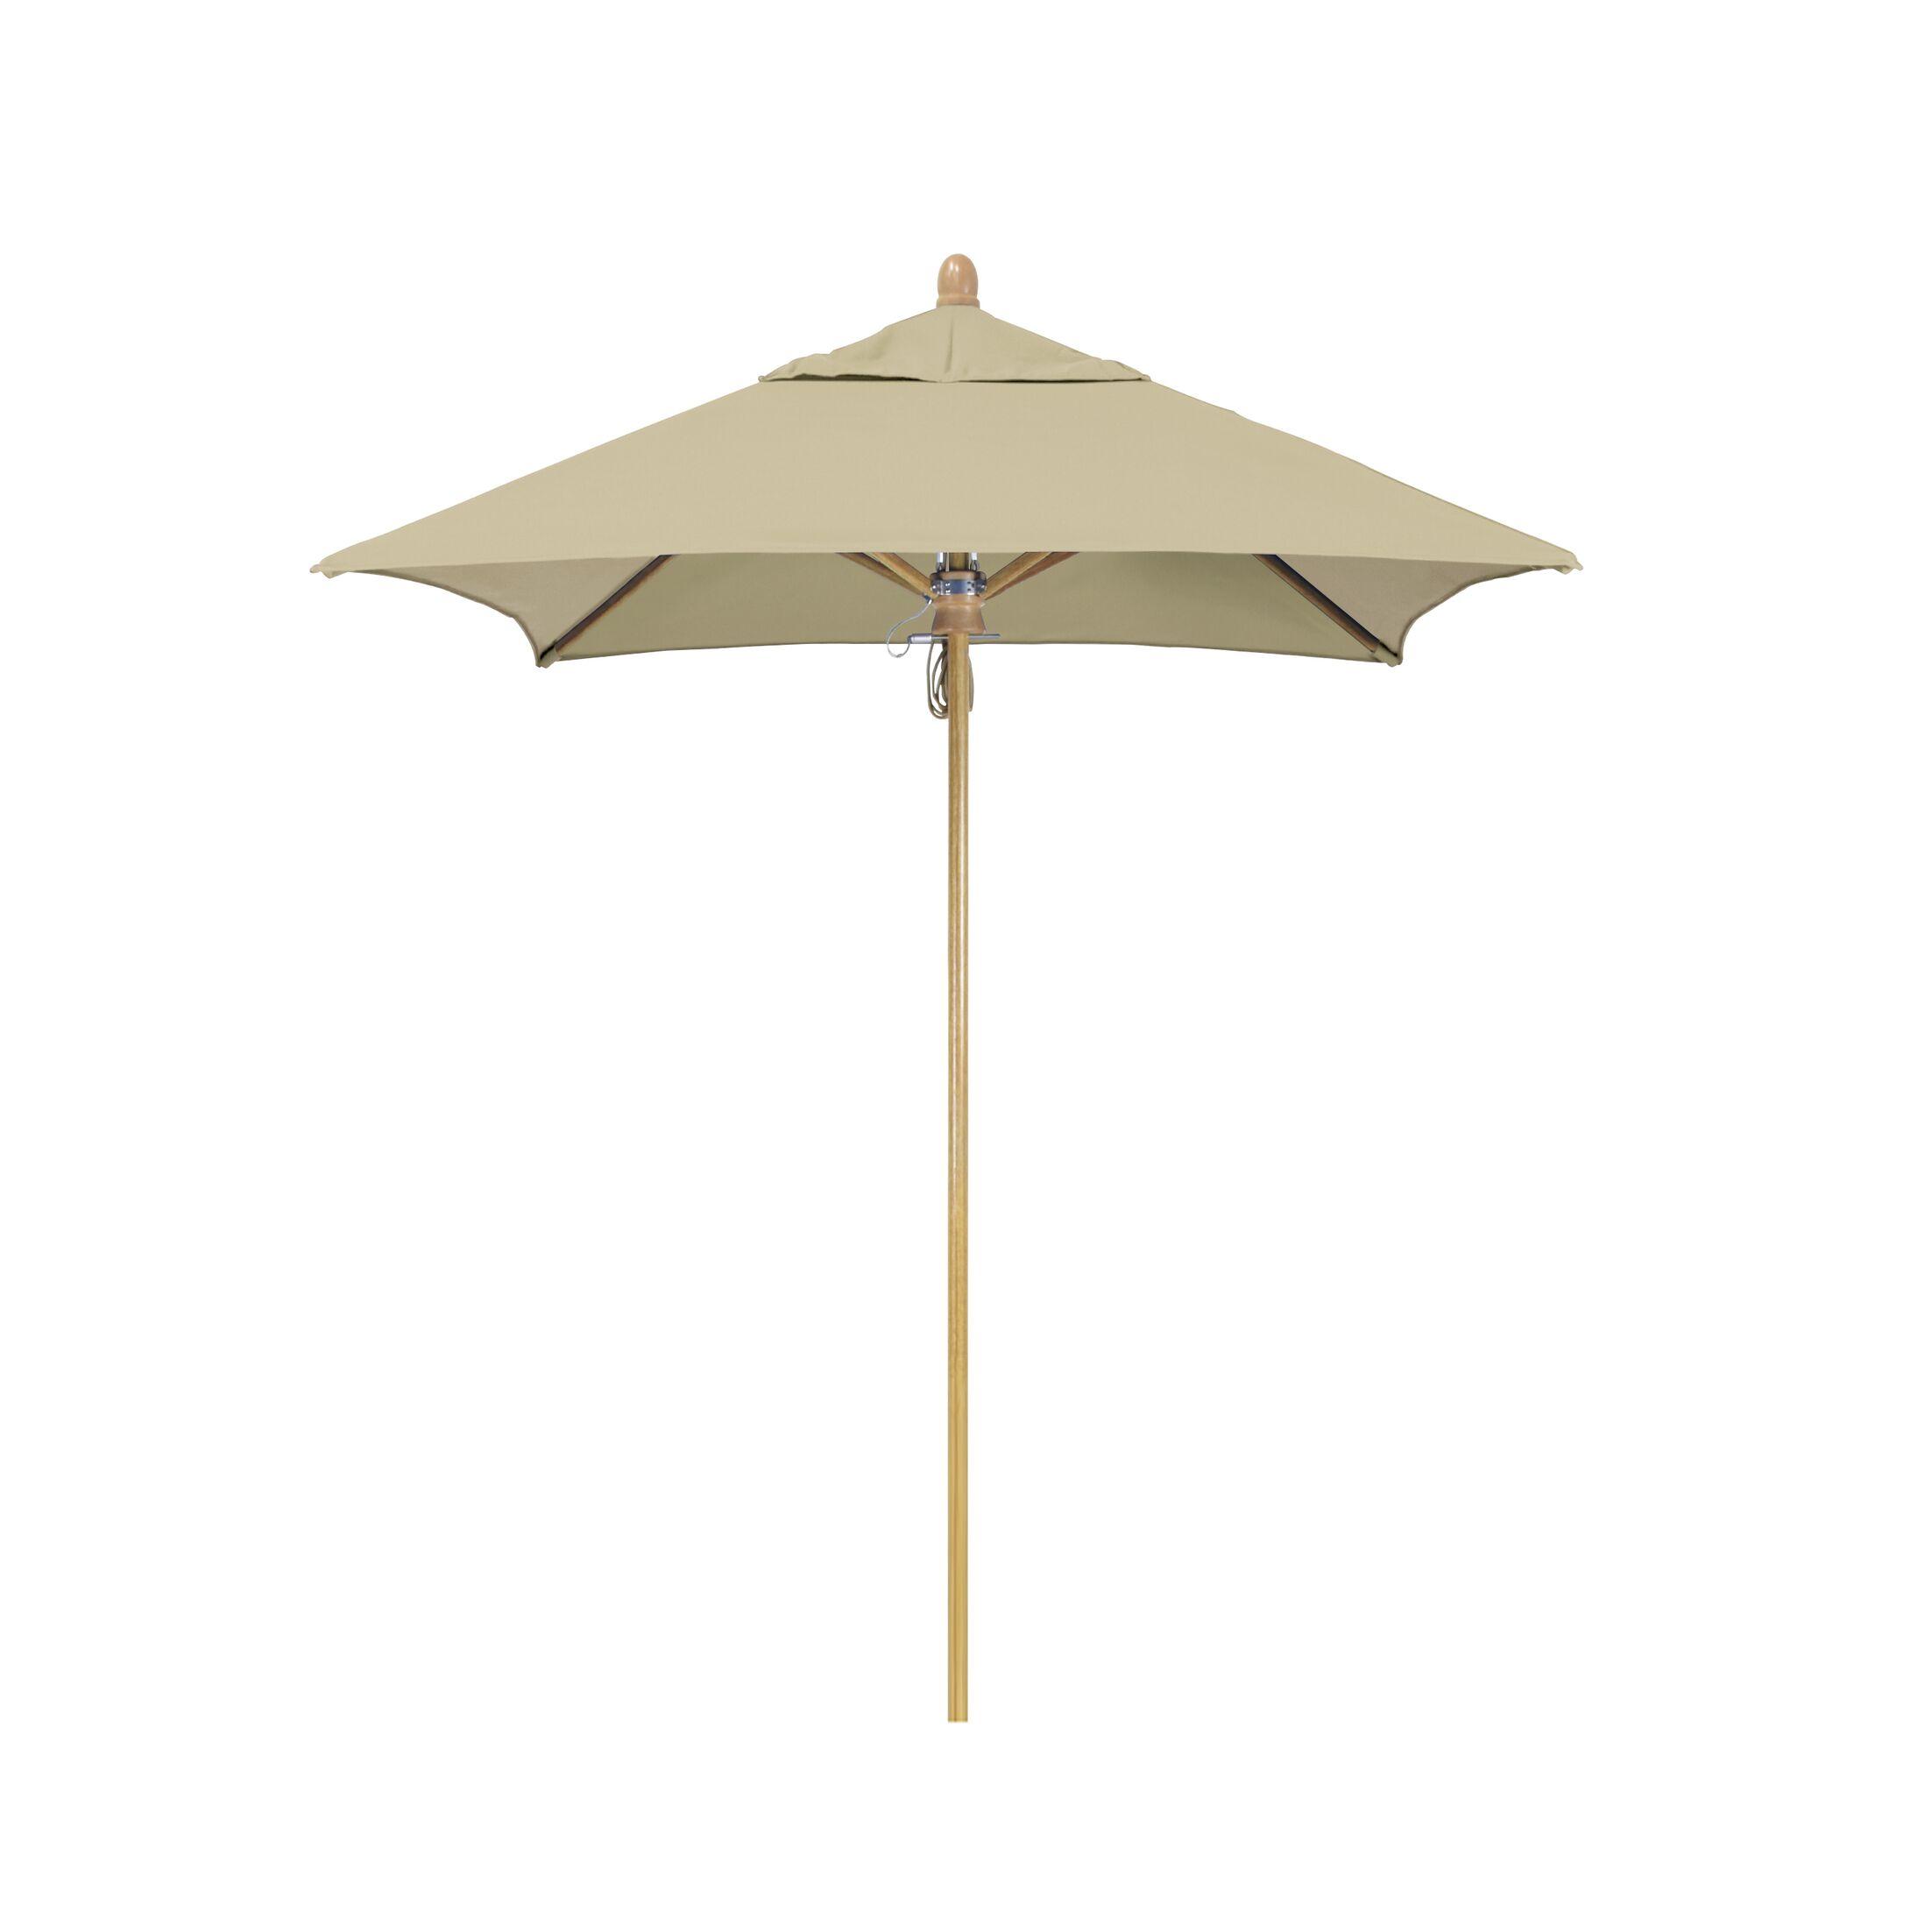 Sierra Series Patio 6' Market Umbrella Fabric Color: Antique Beige, Frame Color: White Oak